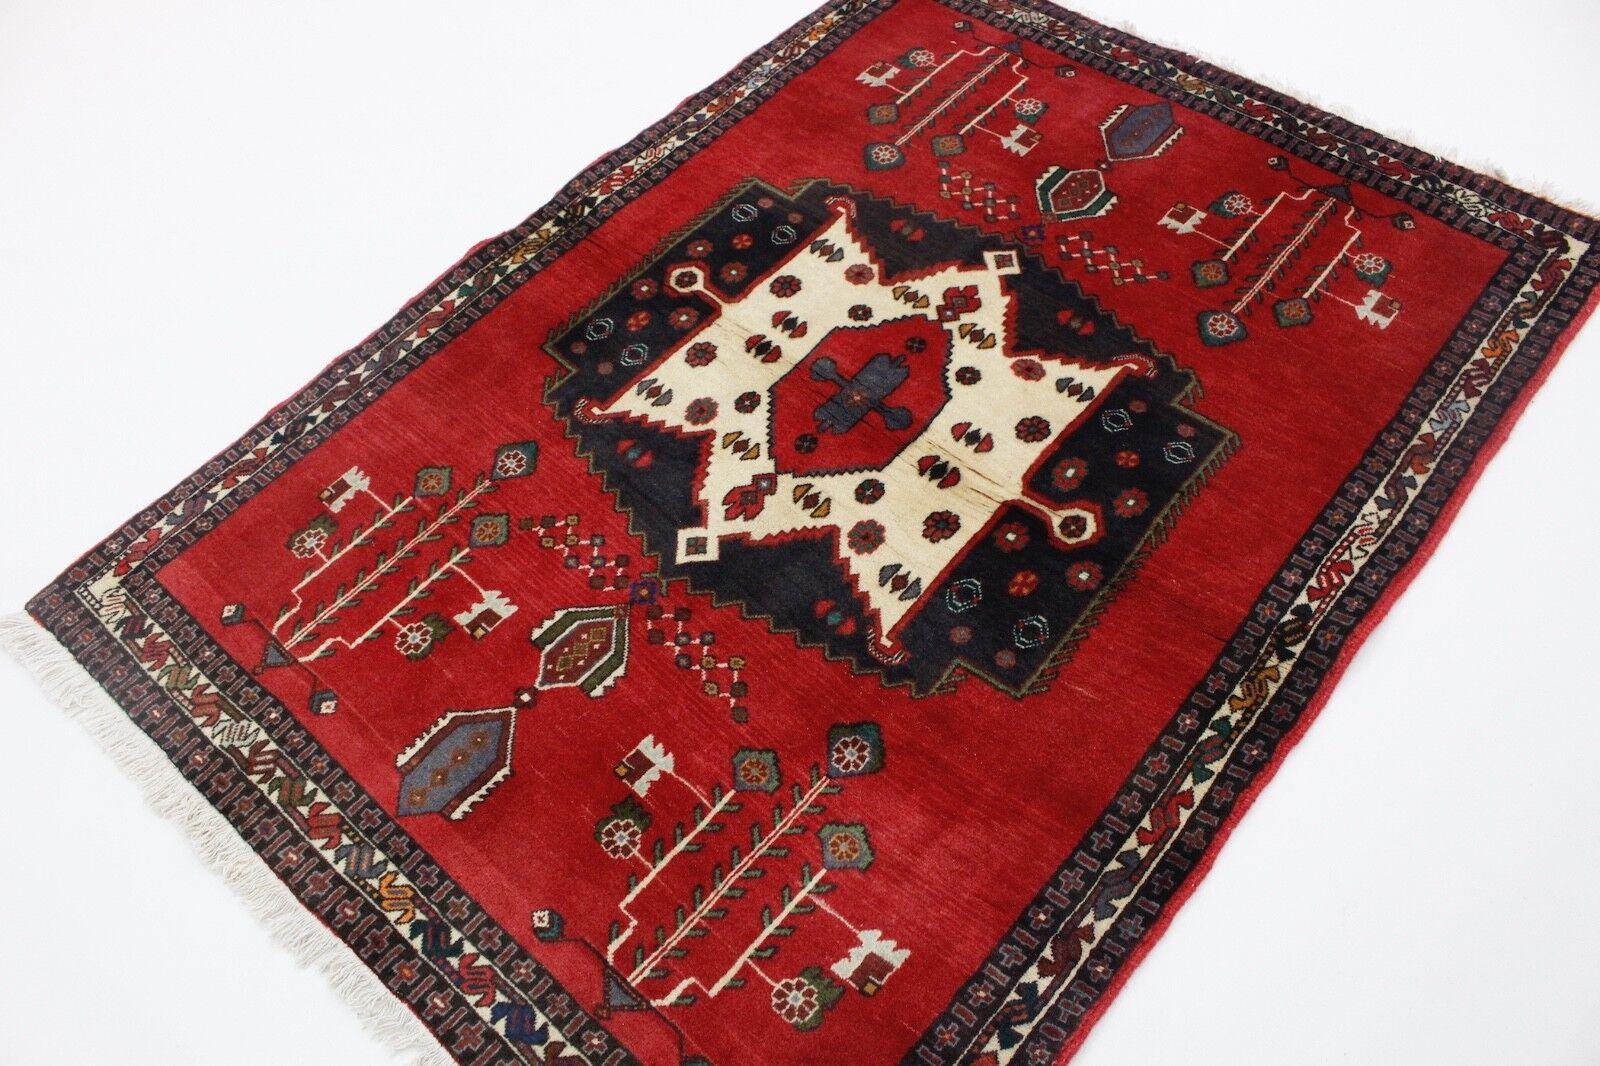 Magazzino vendita Tapis persan SUPER Afshar classico 160x110 mano intessuti intessuti intessuti KL 4173 8aa0ba